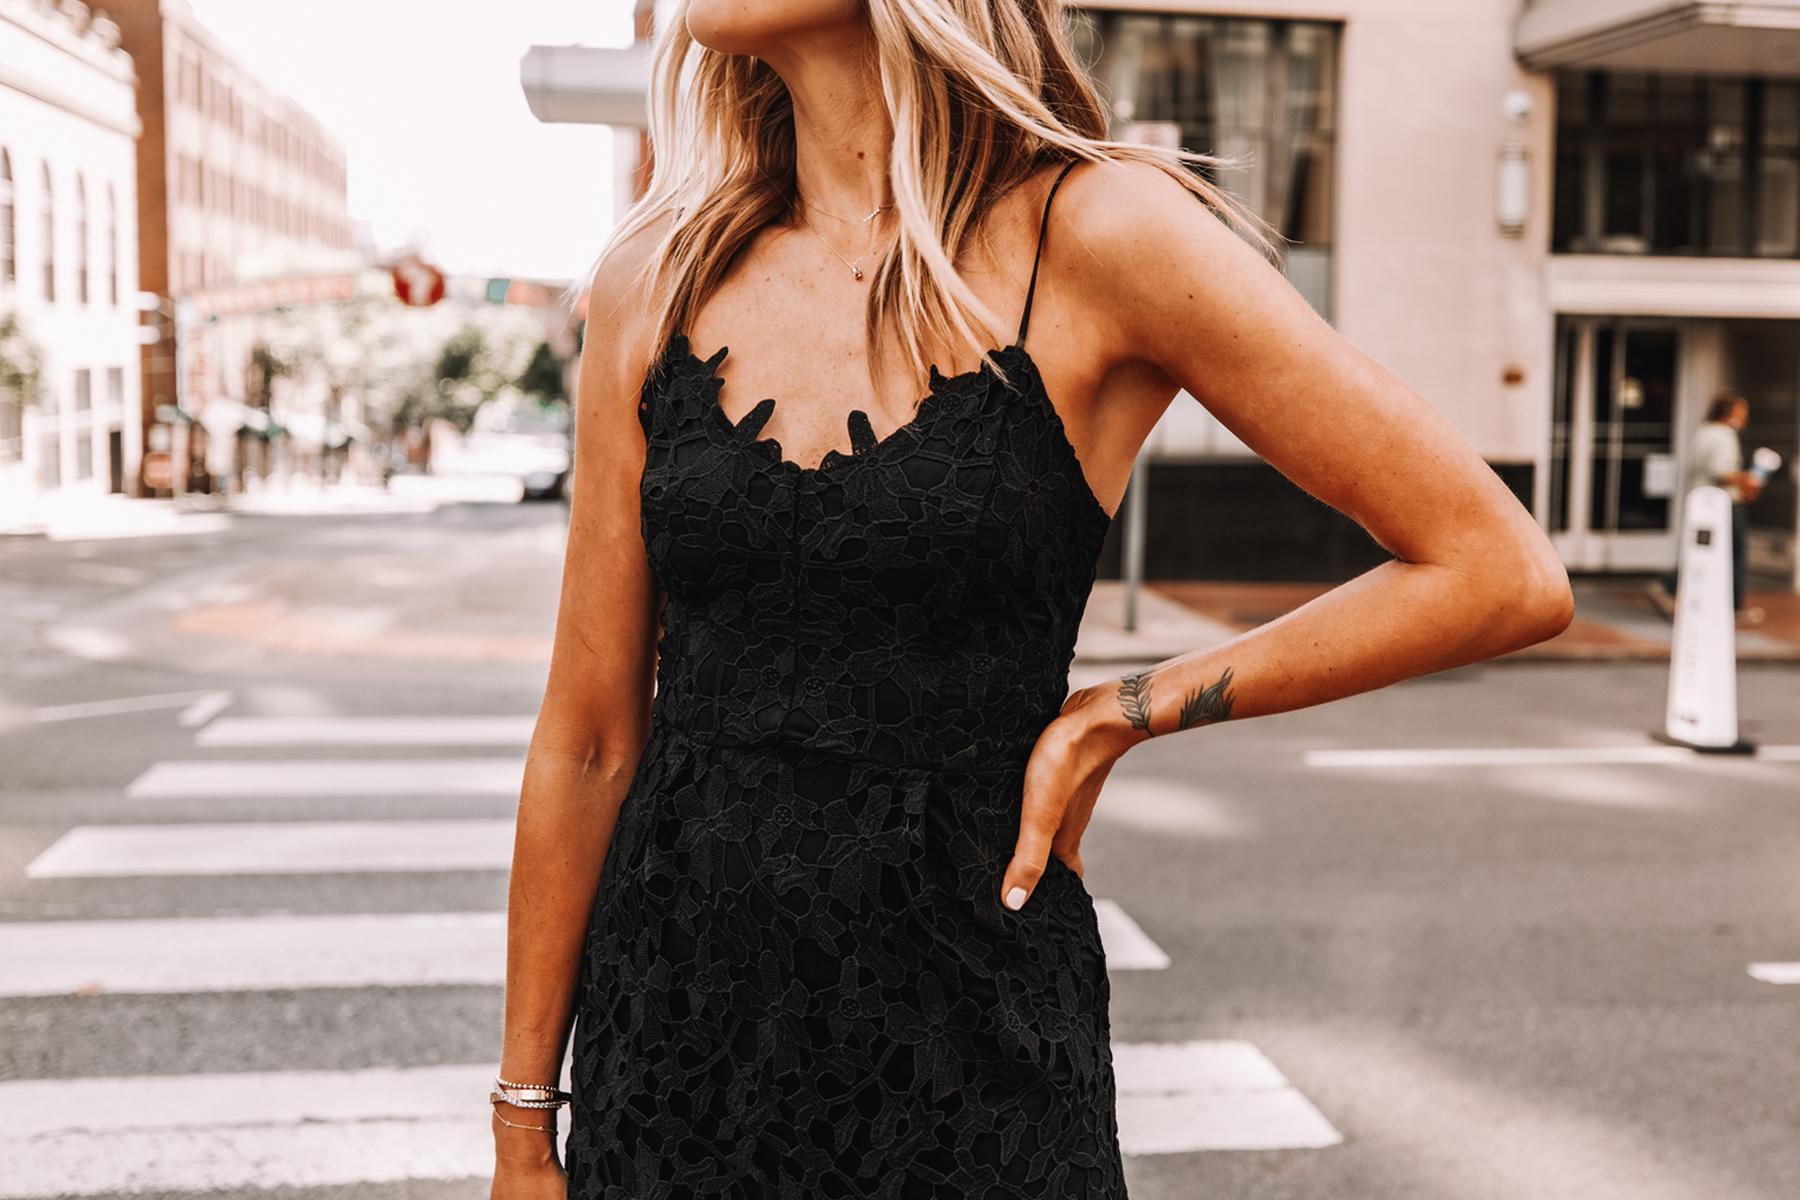 Fashion Jackson Wearing Black Lace Midi Dress Black Celine Sunglasses Cocktail Dress 1